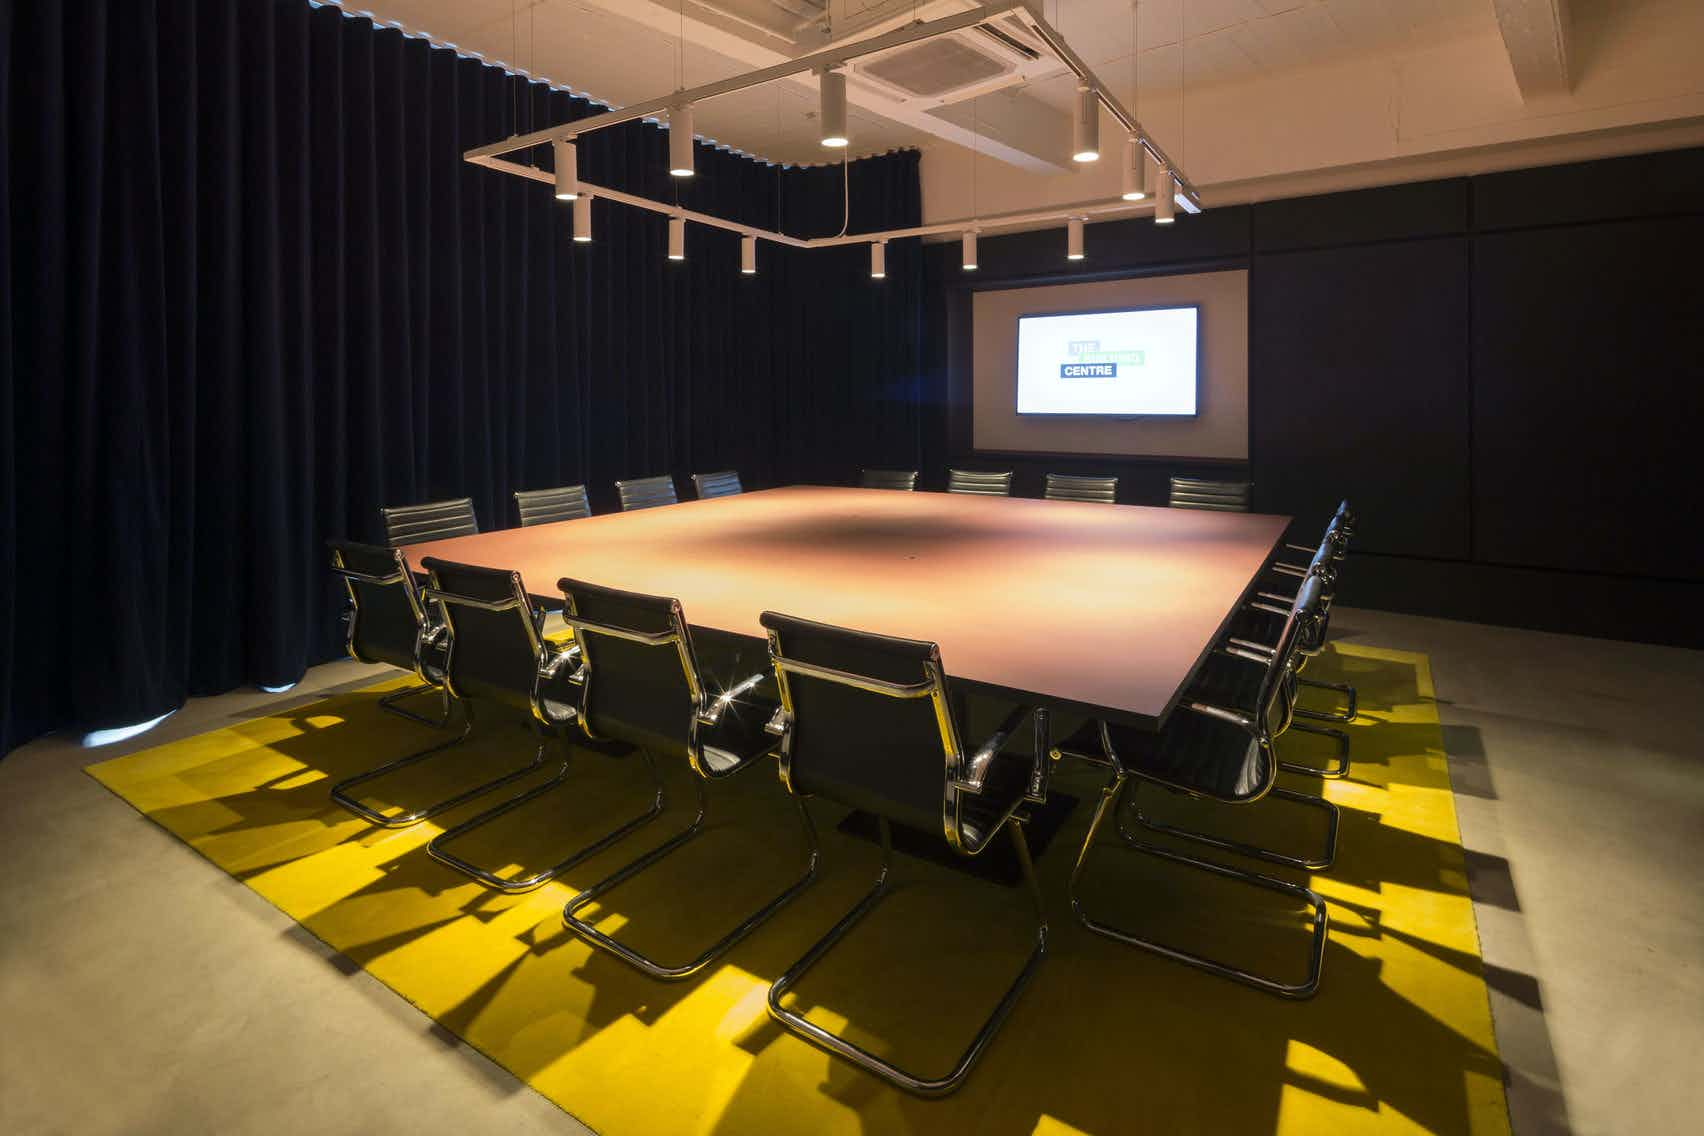 Evening Hire, Boardroom, The Building Centre